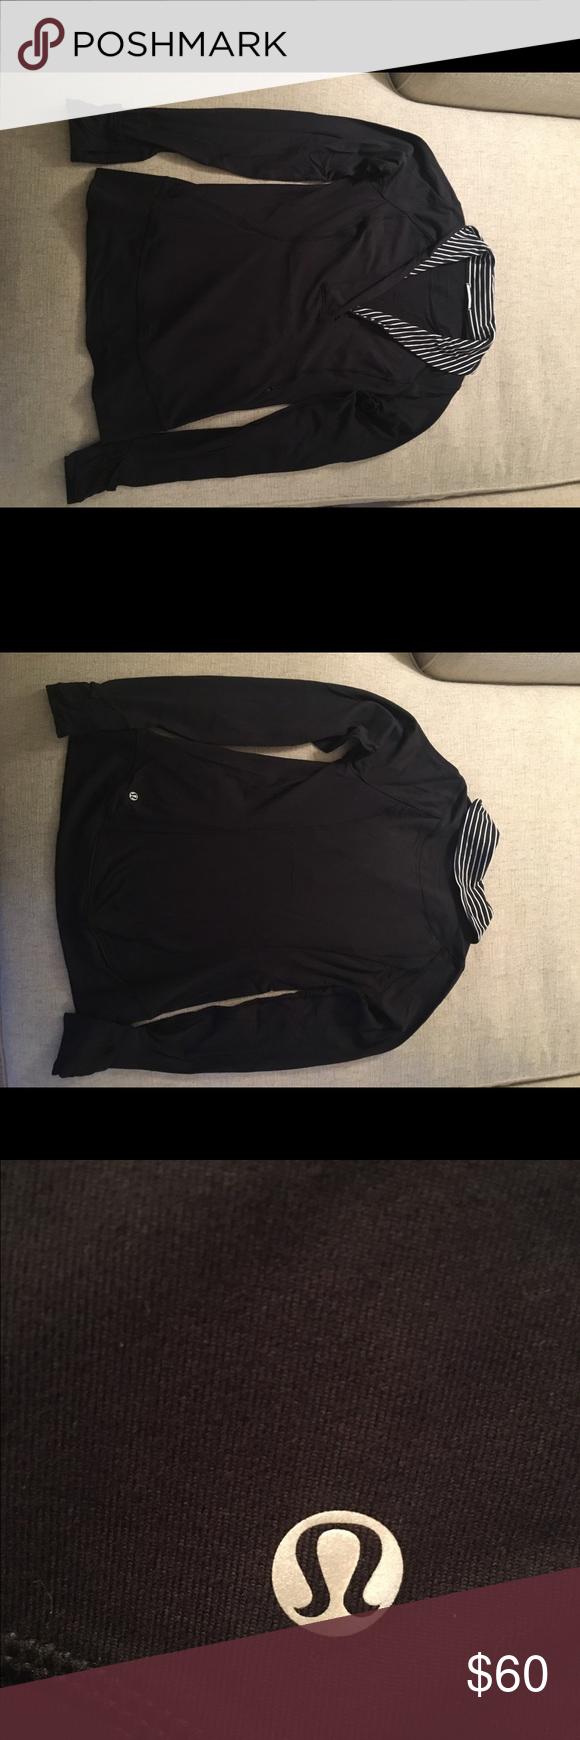 Lululemon 1/4 zip long sleeve Lululemon 1/4 zip long sleeve. Black with striped color, one zipper pocket on side. Very good condition. lululemon athletica Tops Sweatshirts & Hoodies